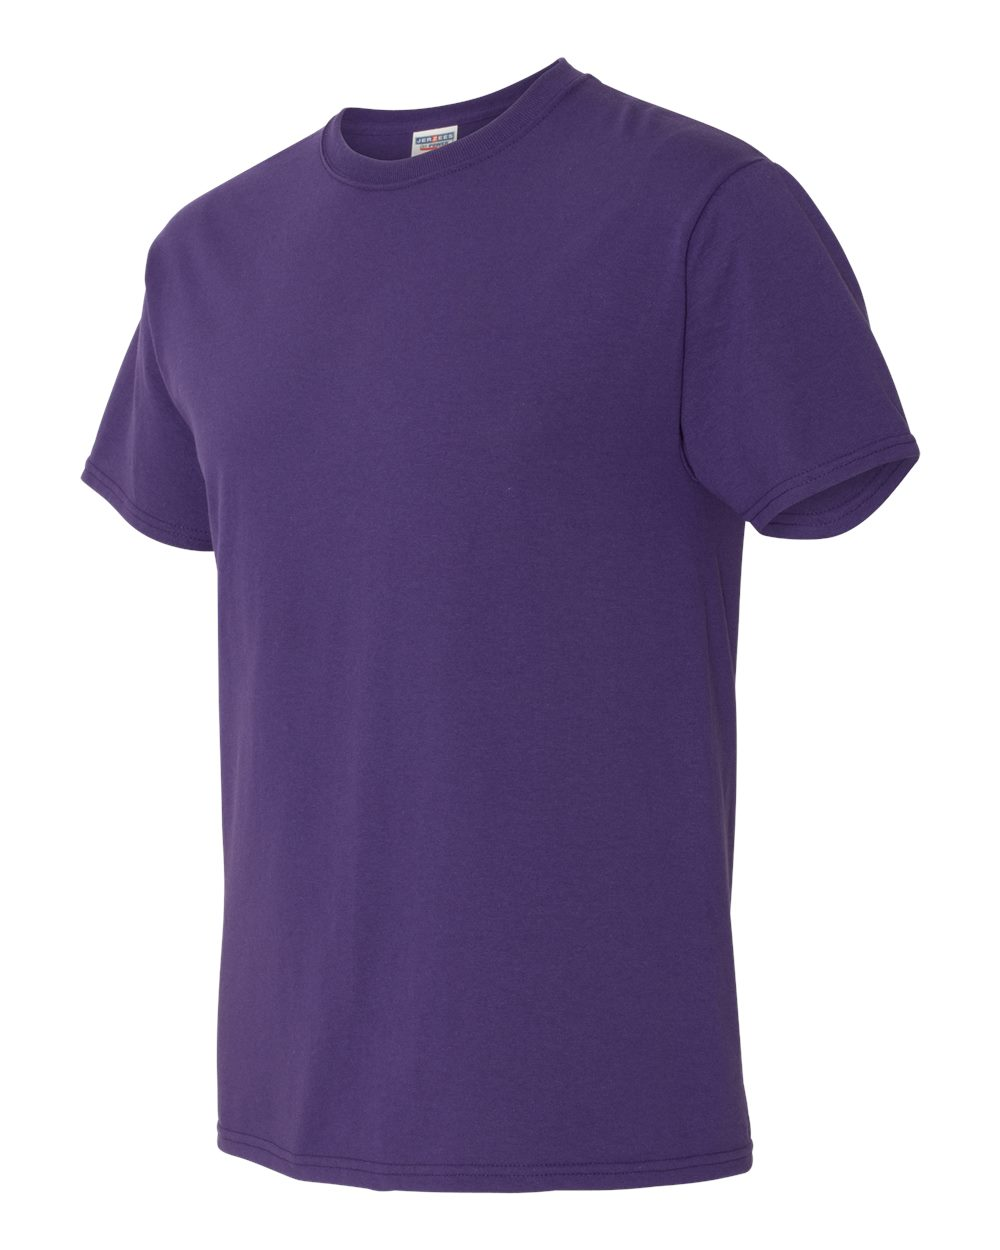 purple-5050.jpg